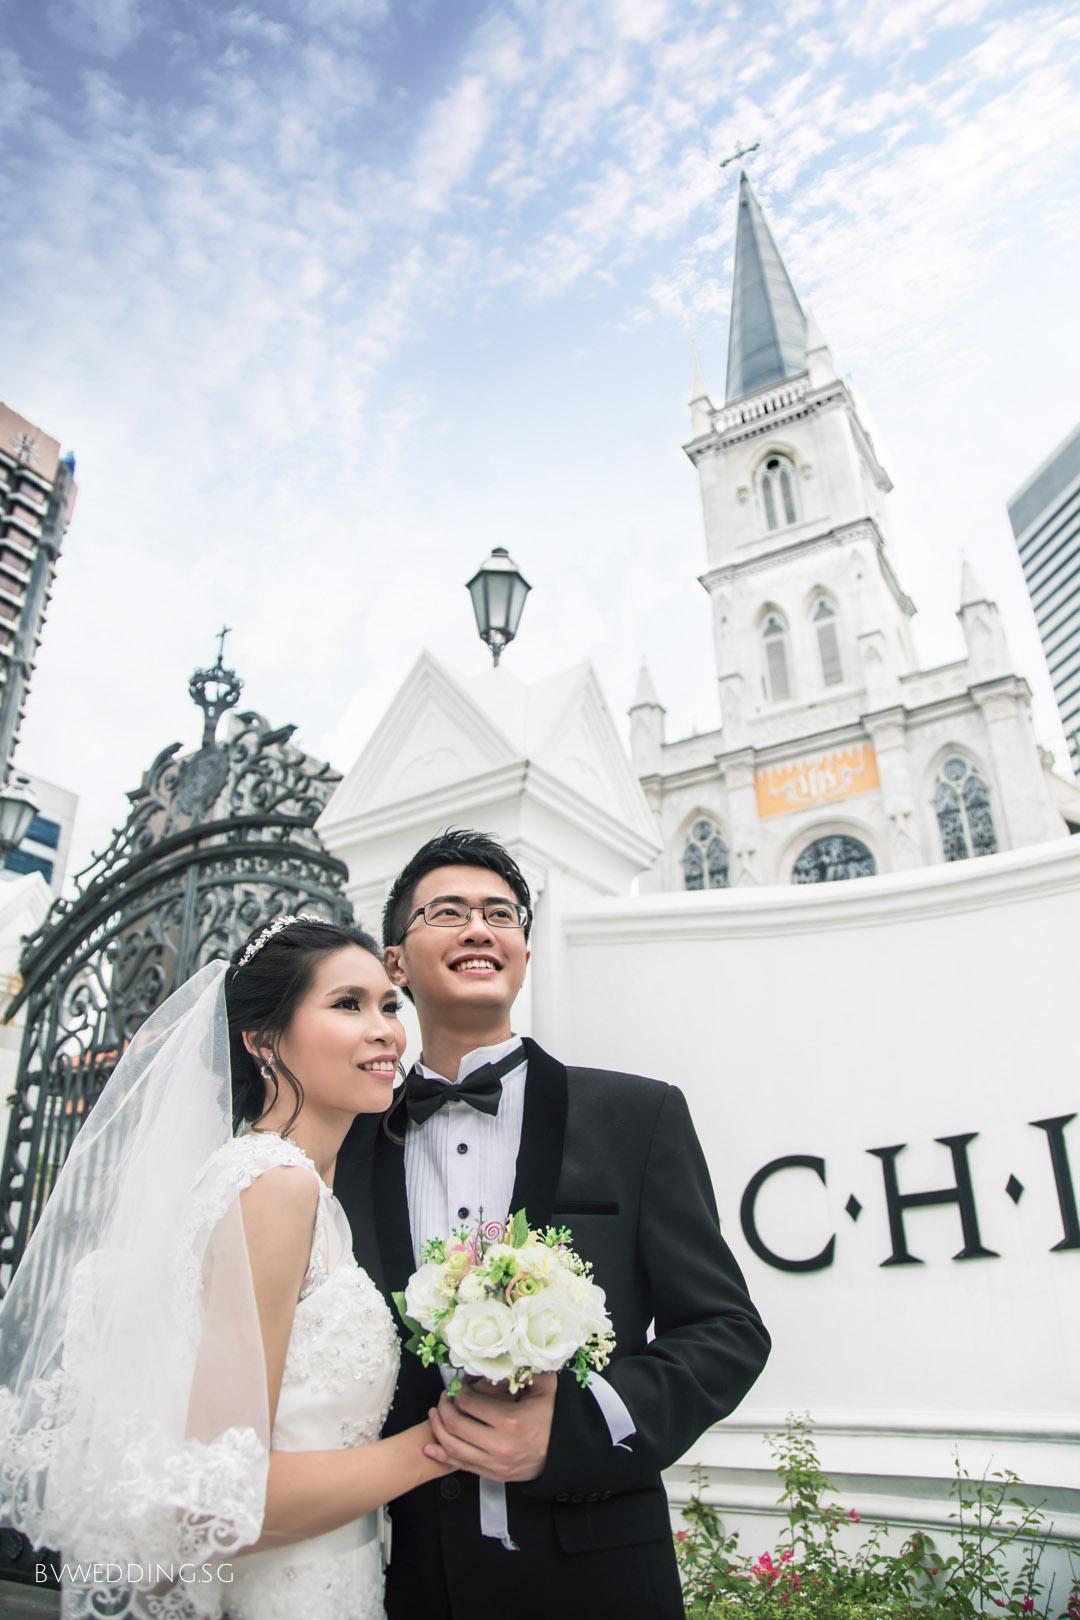 Pre-wedding Photoshoot at CHIJMES